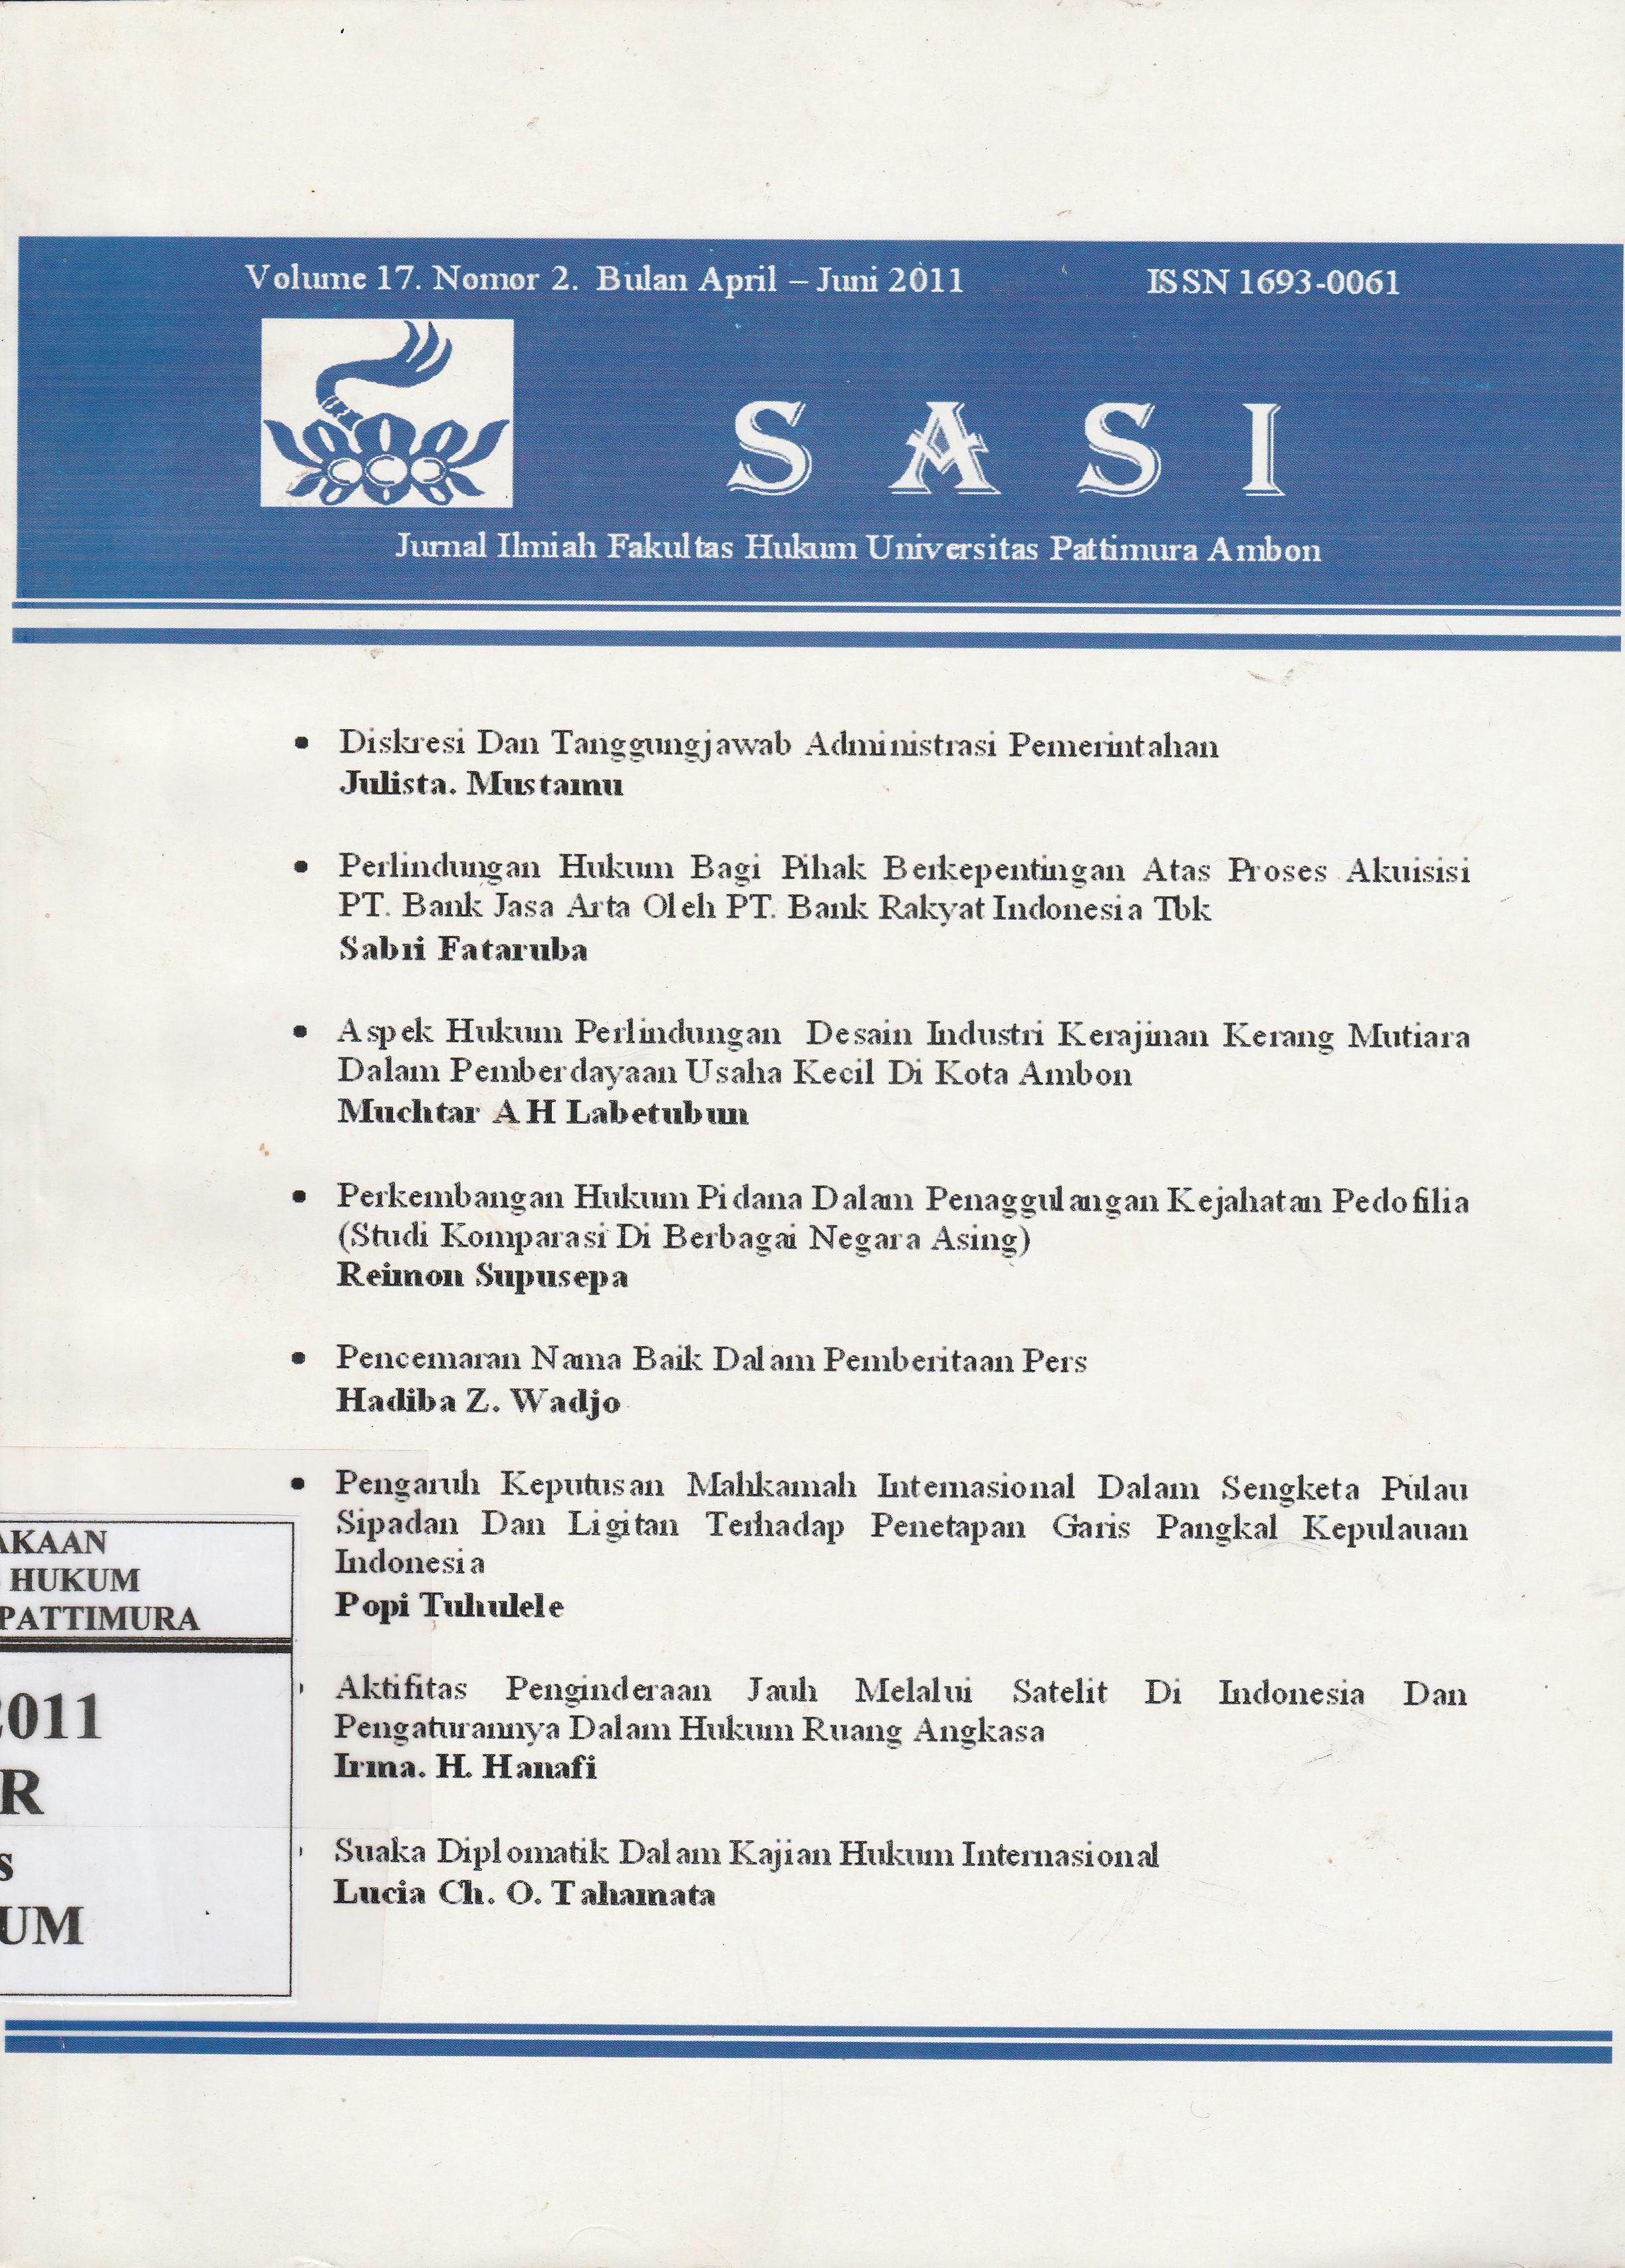 Volume 17 Nomor 2, April - Juni 2011